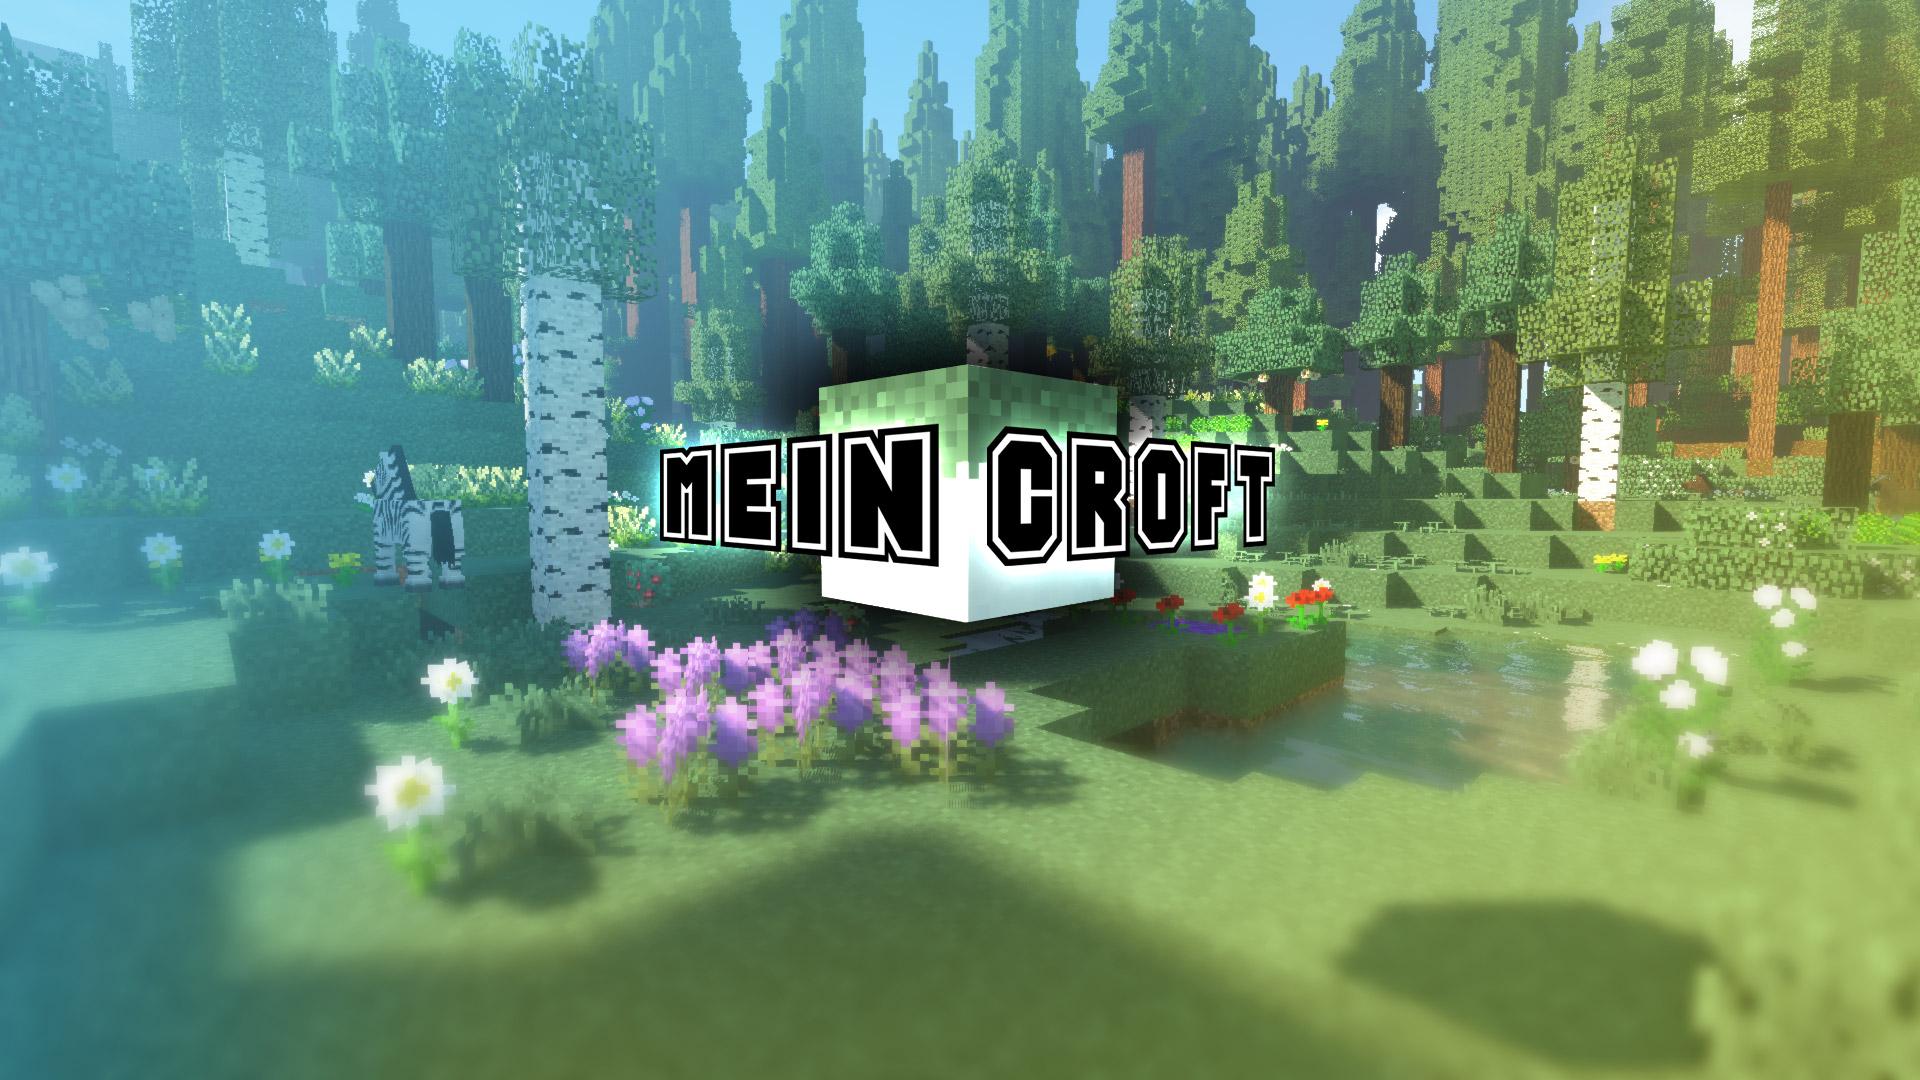 MeinCroft Titelbild